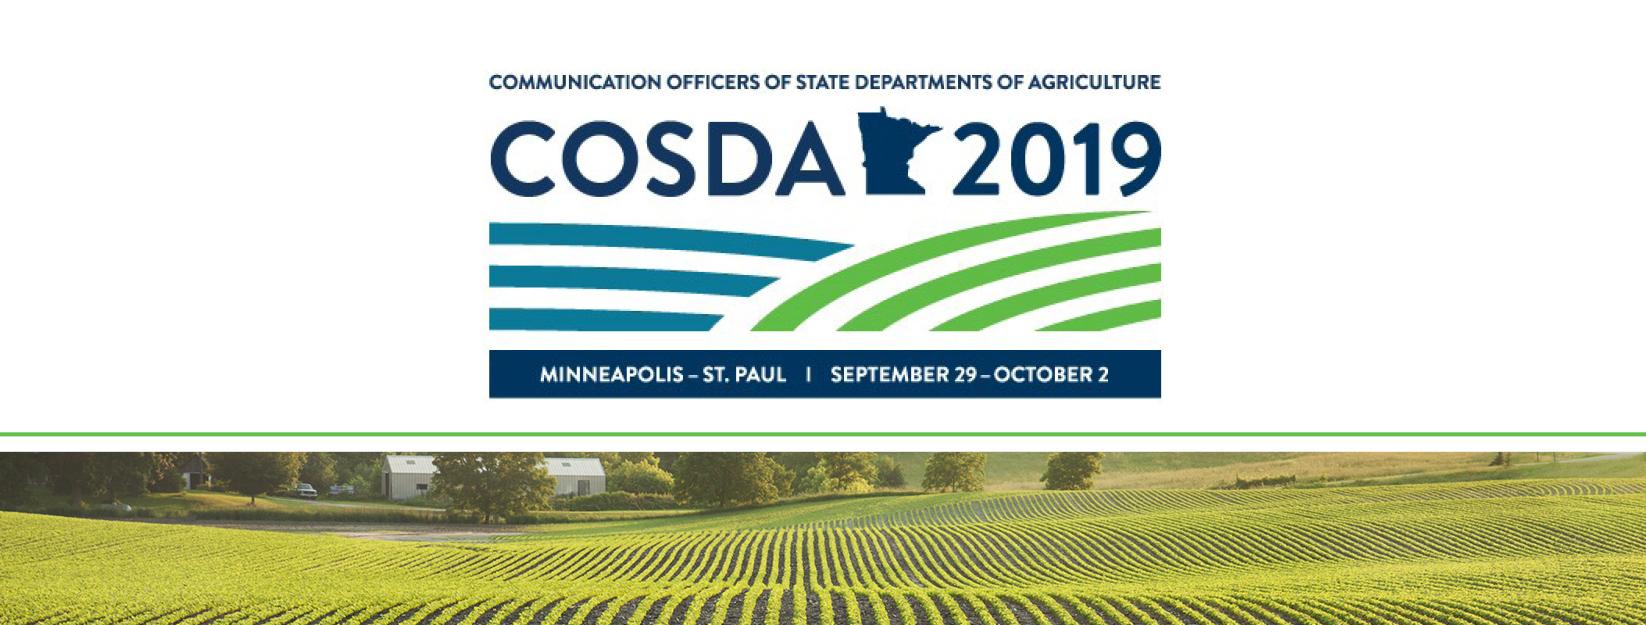 2019 COSDA Annual Meeting